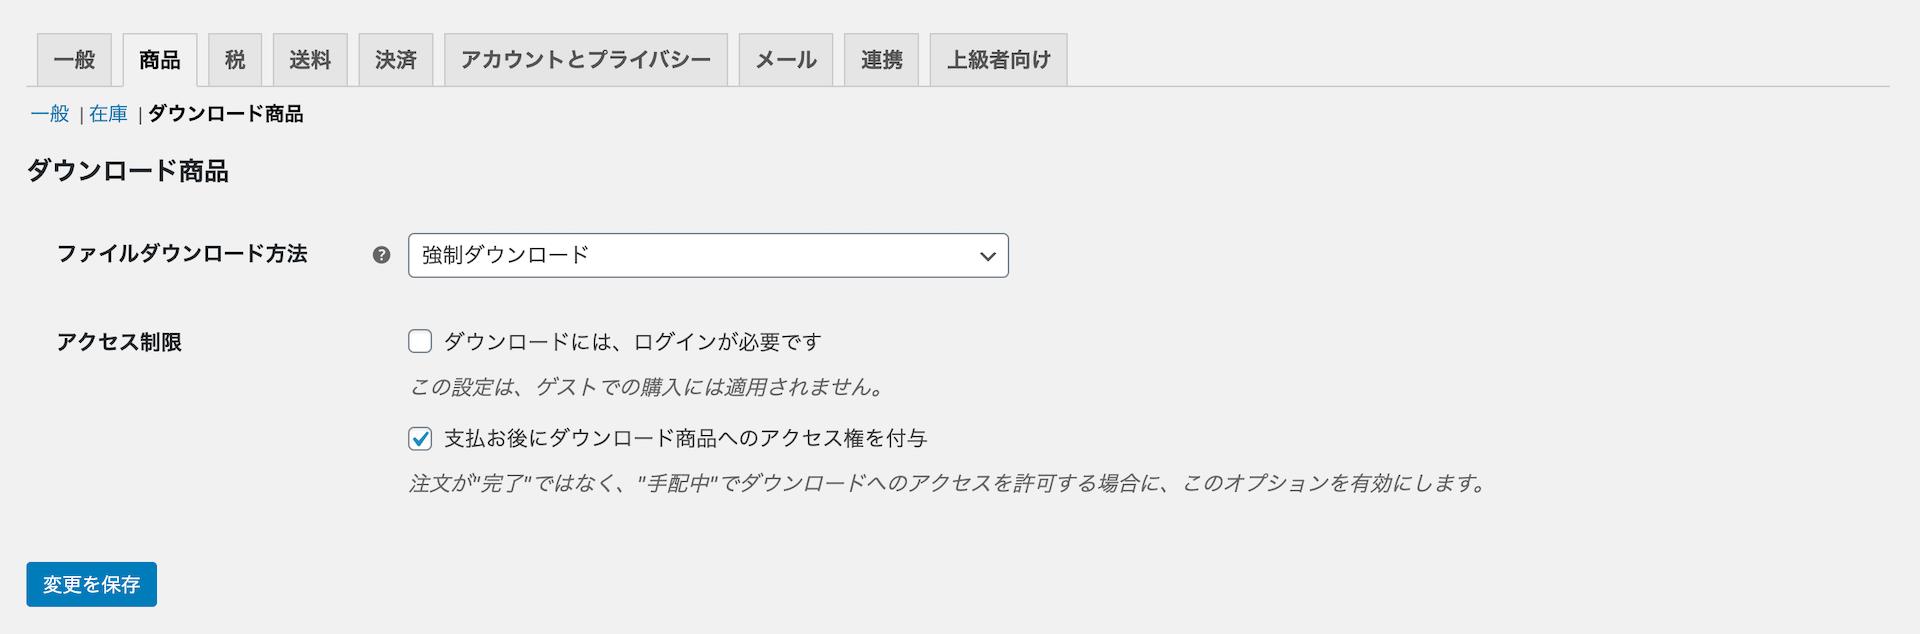 WooCommerce 商品のダウンロード商品の設定